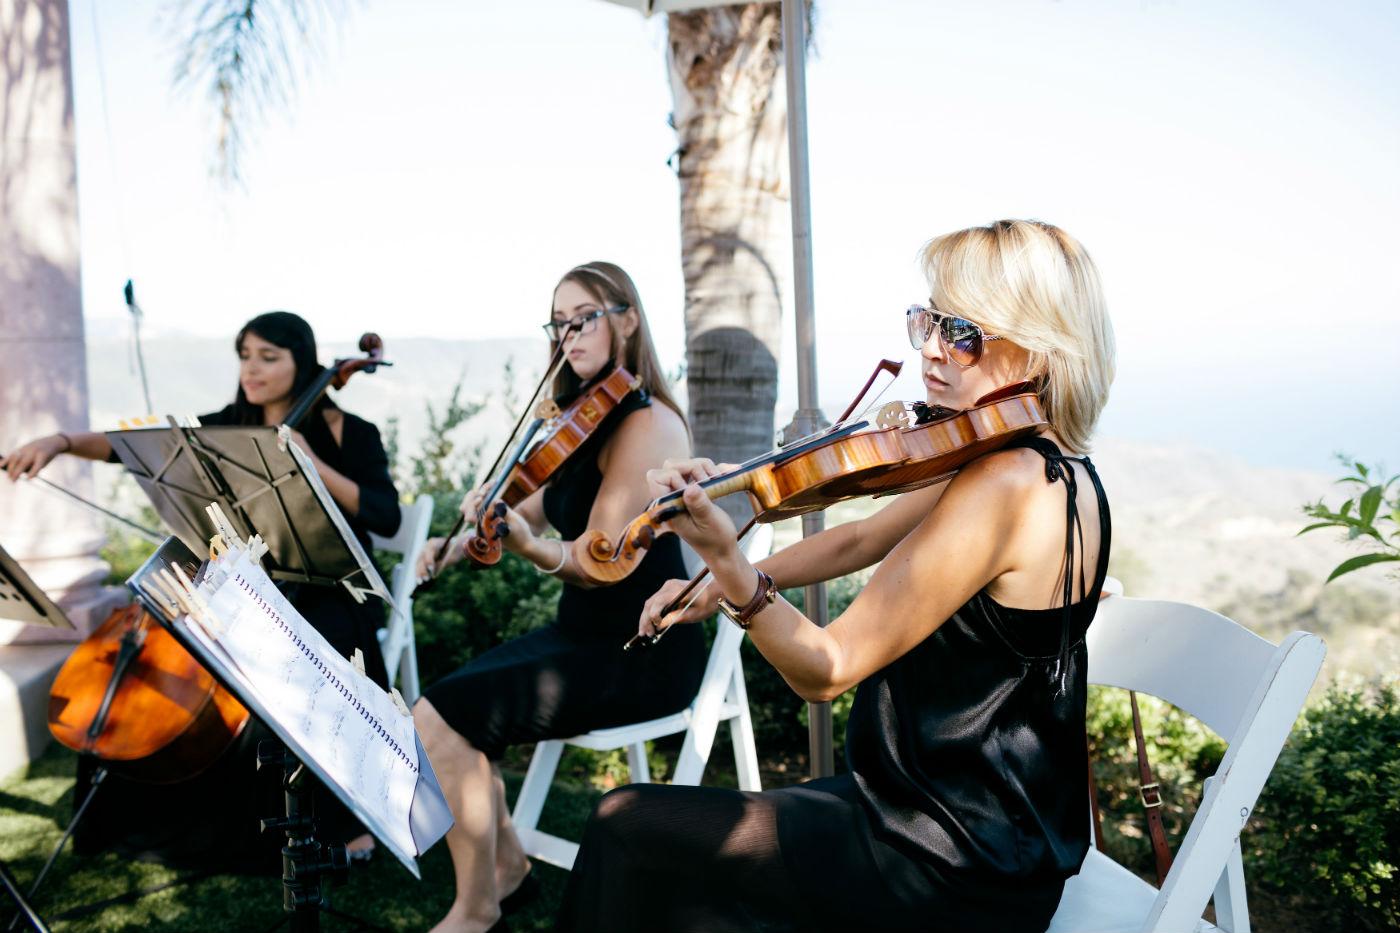 los-angeles-chicago-wedding-music-ceremony-strings-string-quartet-violin-cello-cocktial-musicians-mailbu-pacific-coast-strings-1.jpg